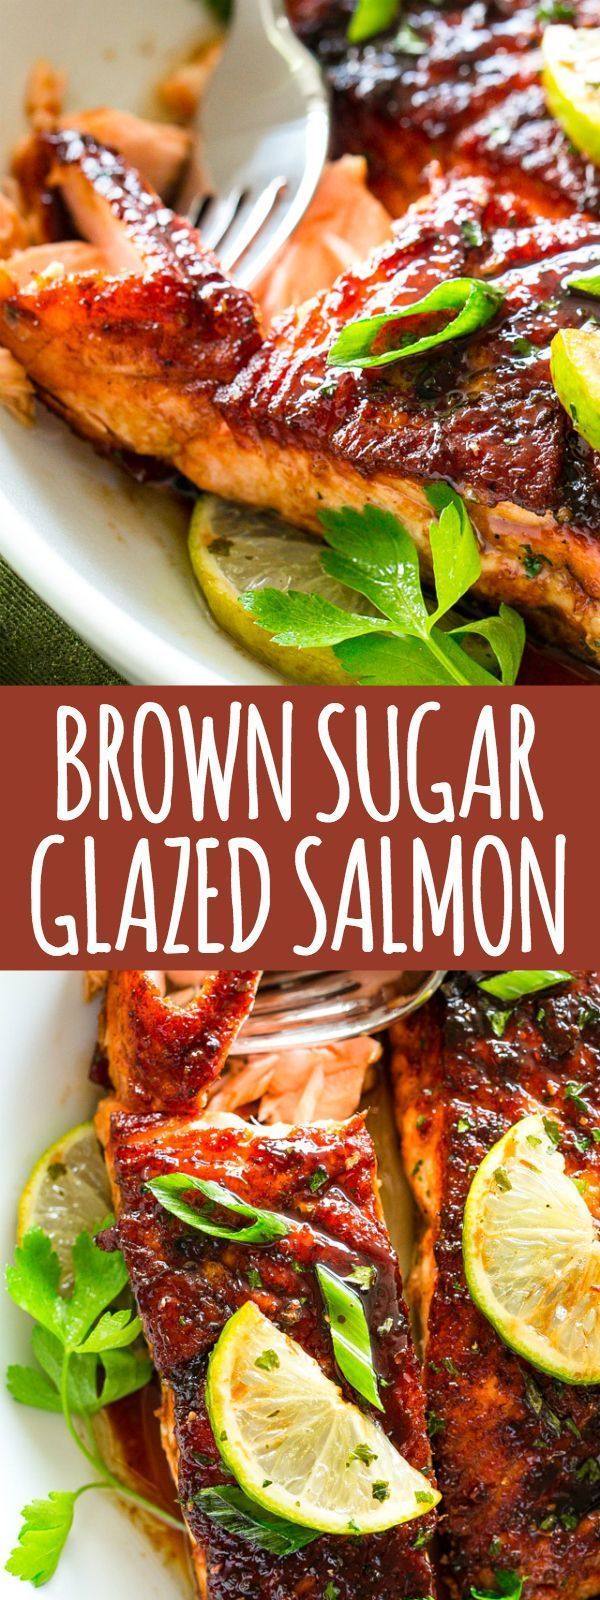 Brown Sugar Glazed Salmon (The BEST Pan Seared Salmon Recipe Ever!)